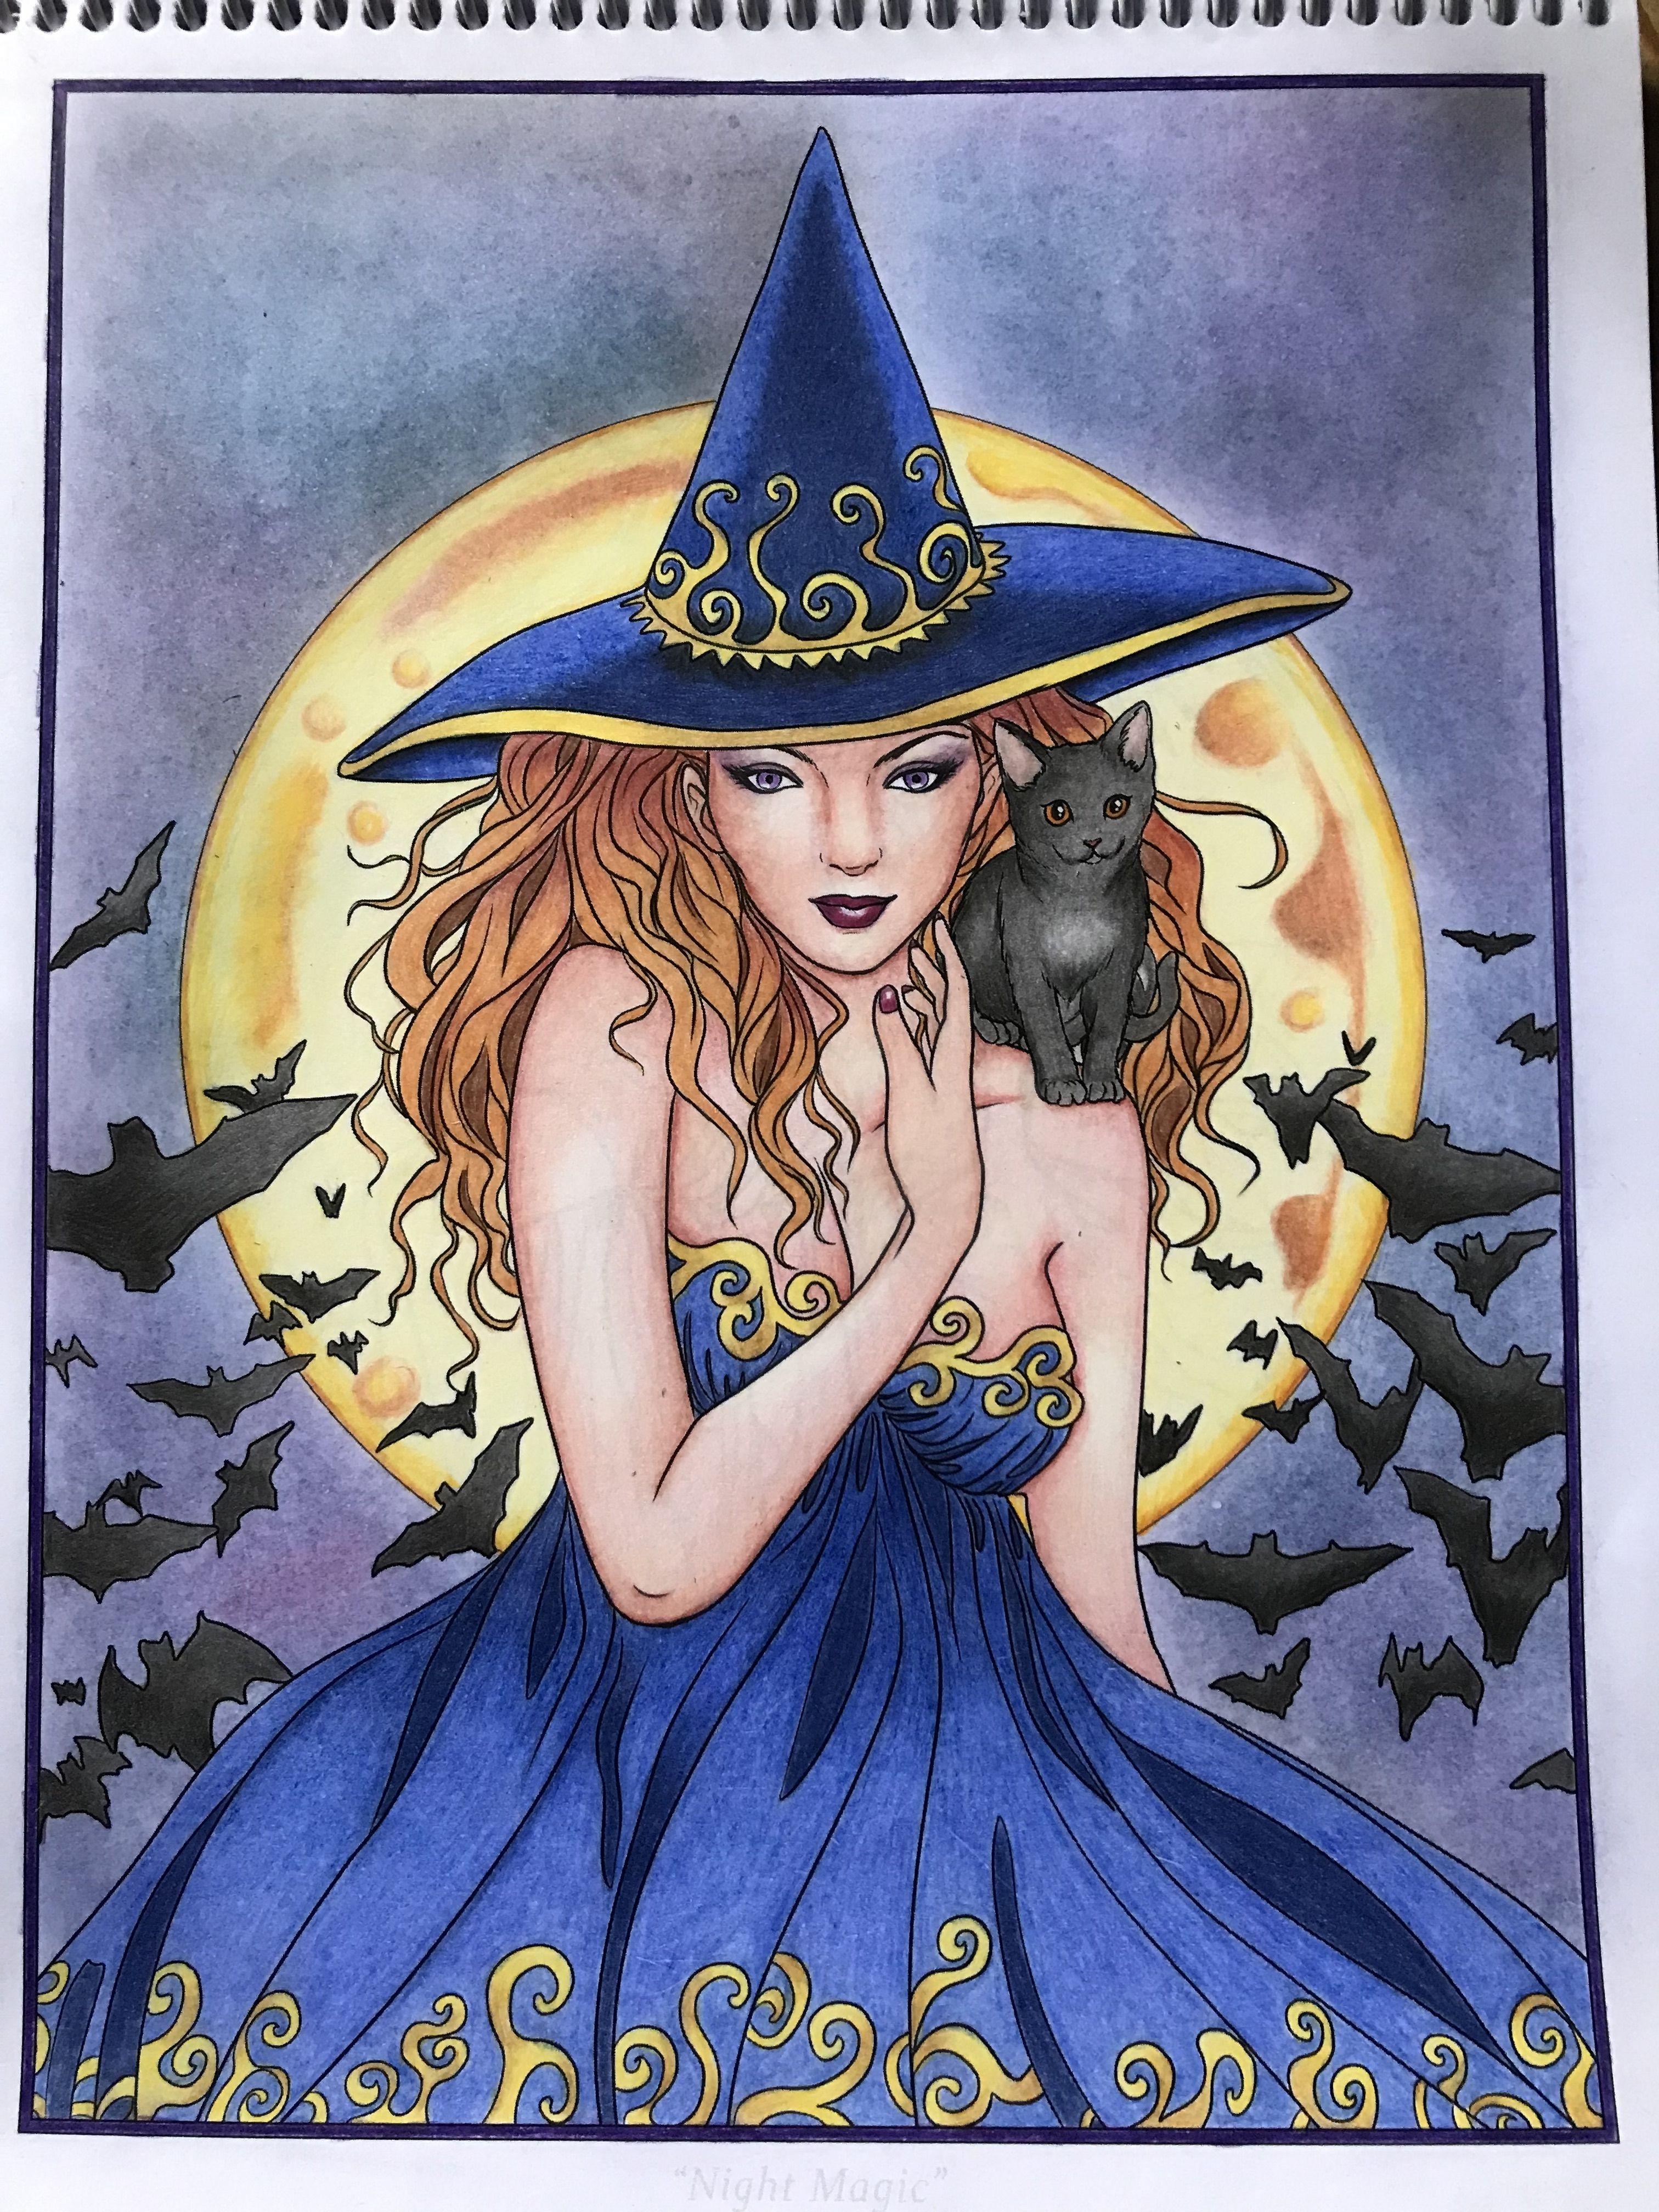 Pin On Selina Fenech Night Magic Colouring Book